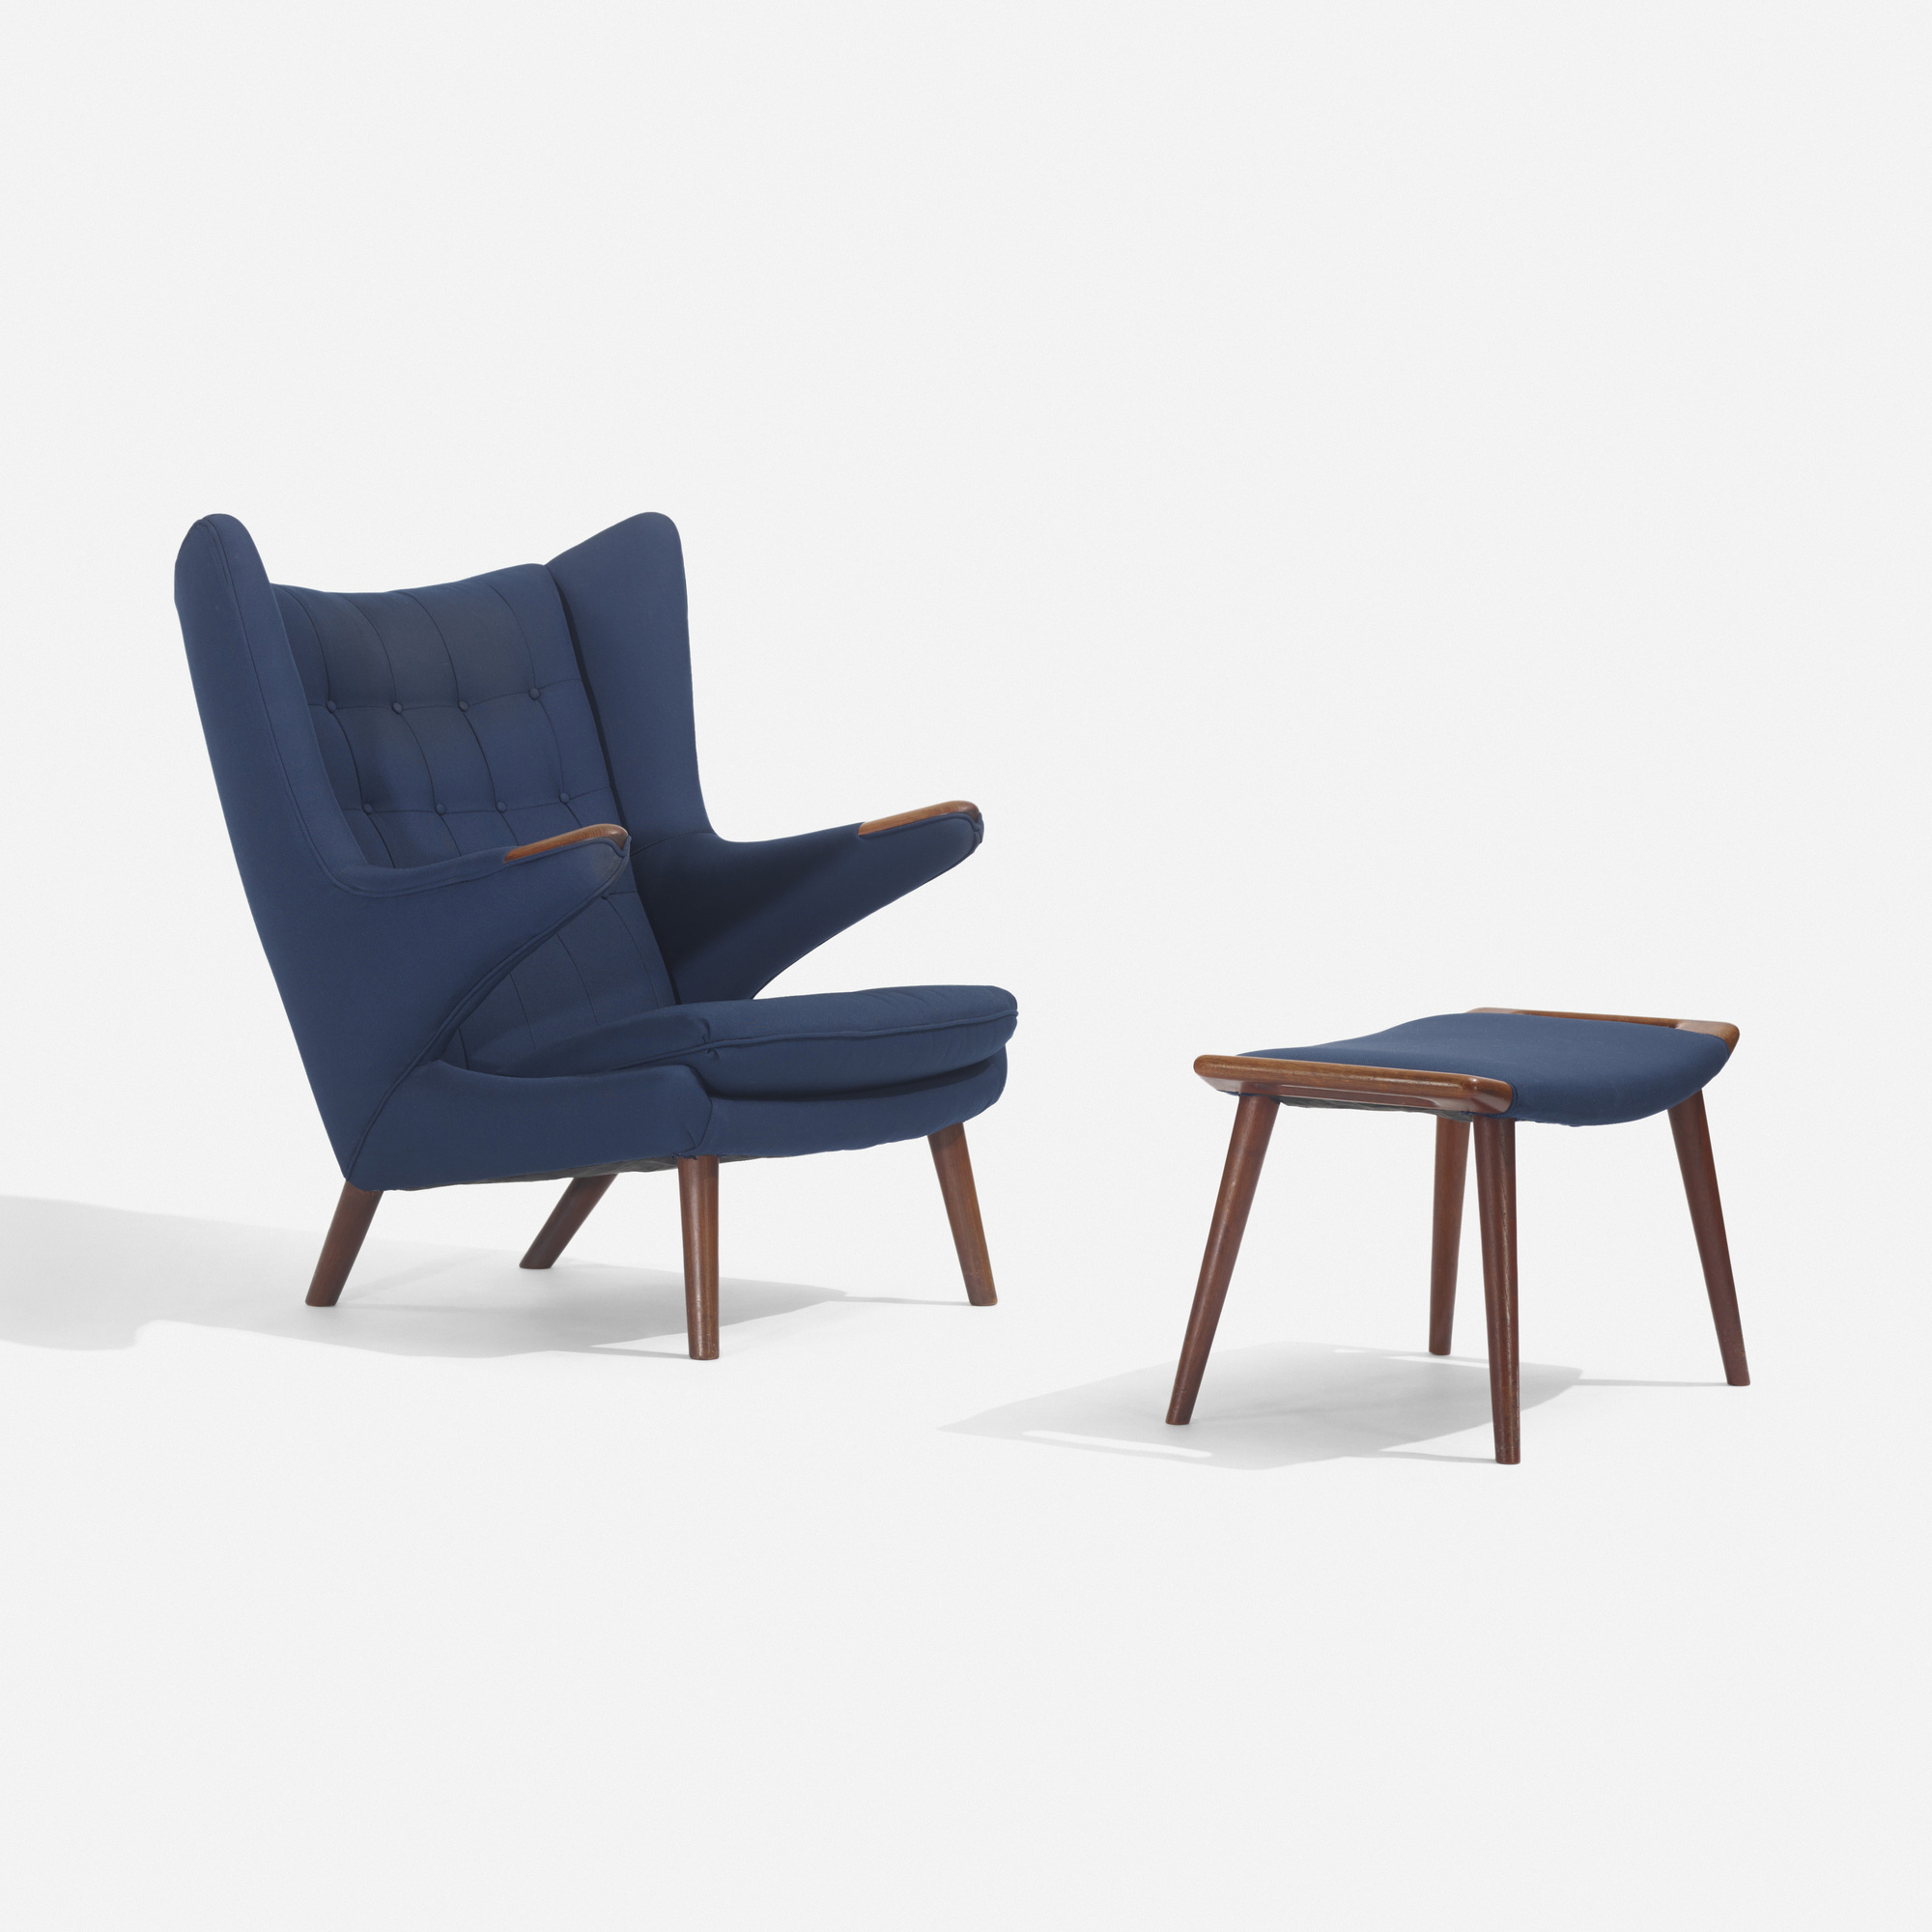 126: Hans J. Wegner / Papa Bear chair and ottoman (1 of 3)